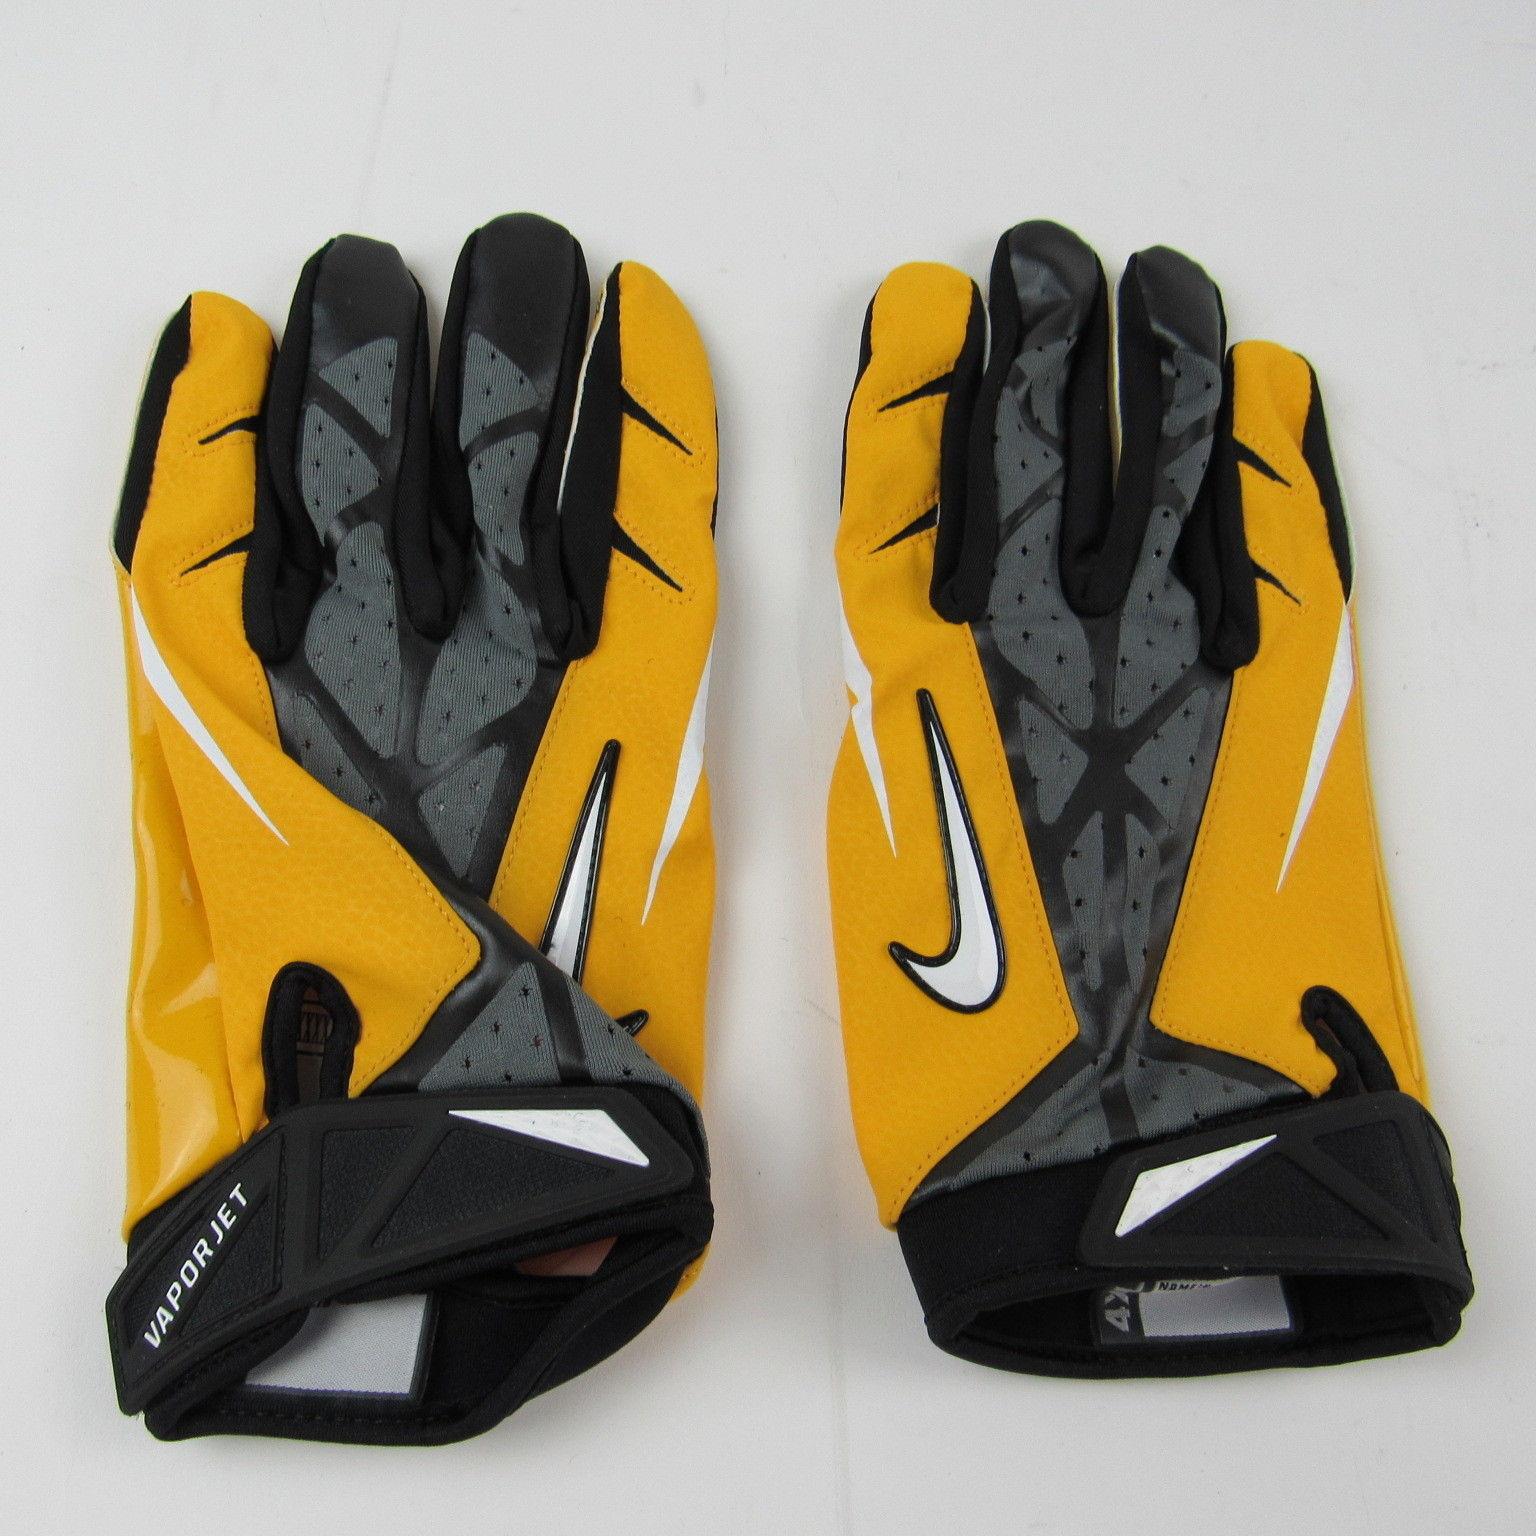 new product 97162 aca7e NEW Nike Vapor Jet Football Gloves Adult and 50 similar items. S l1600